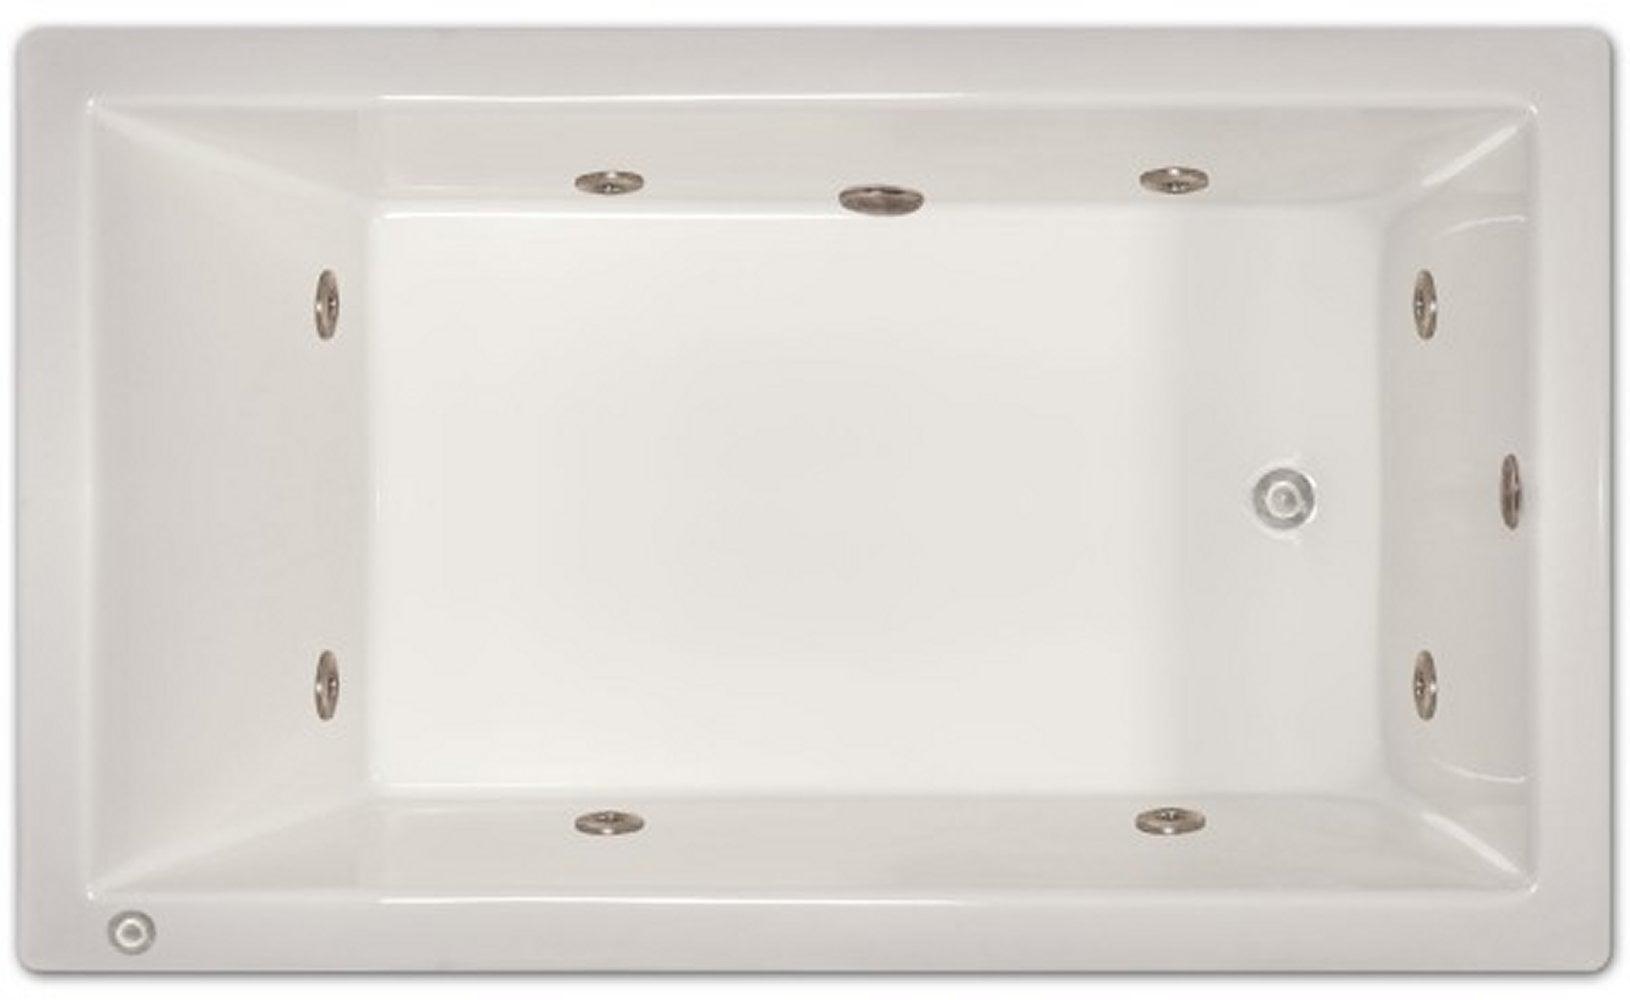 Drop-in Bathtub / 72x42x18 / high gloss white acrylic / Rectangle / LPI228-W-LD Pinnacle Bath - Whirlpool 0